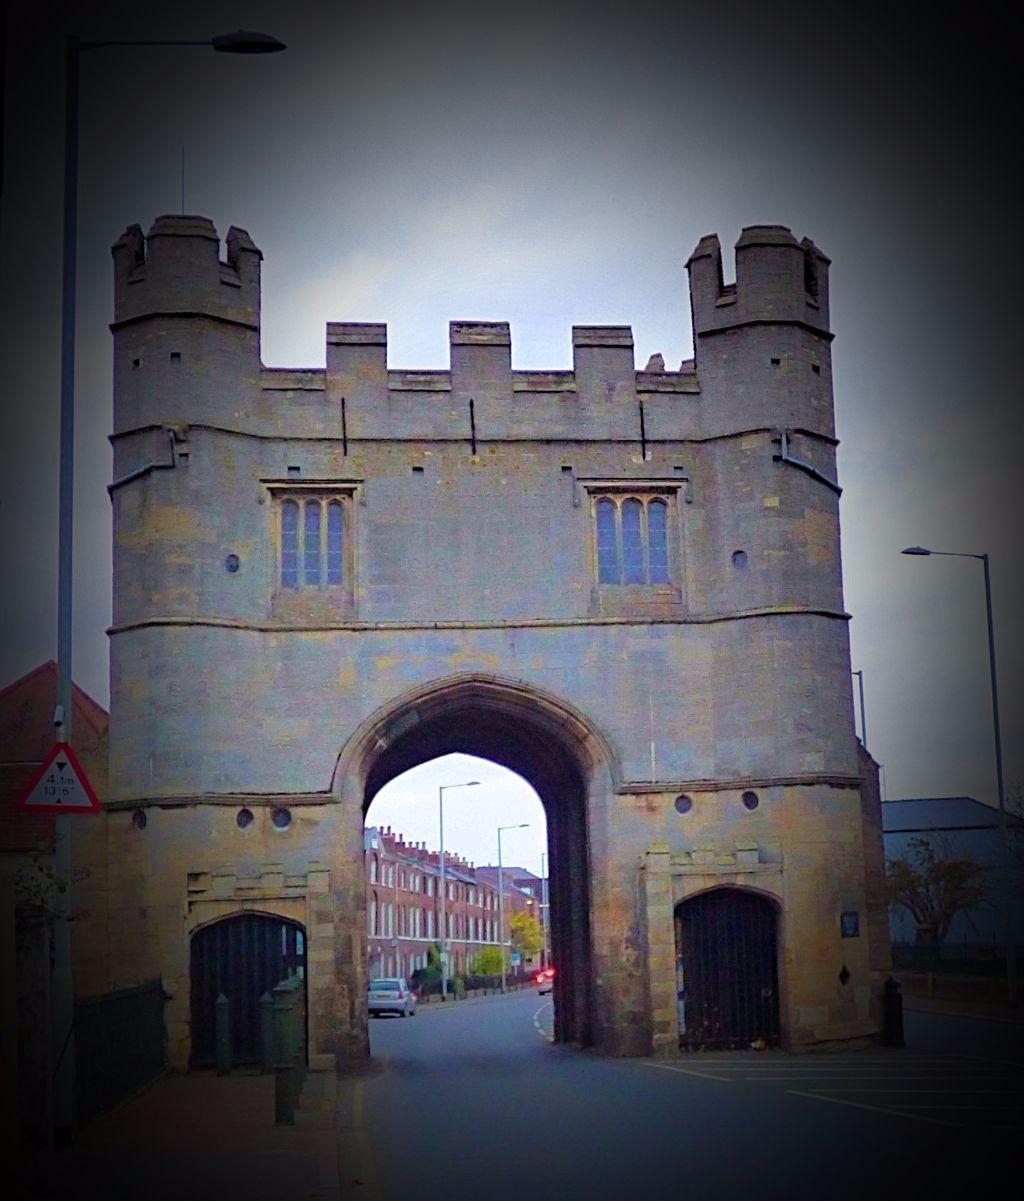 South Gate 2